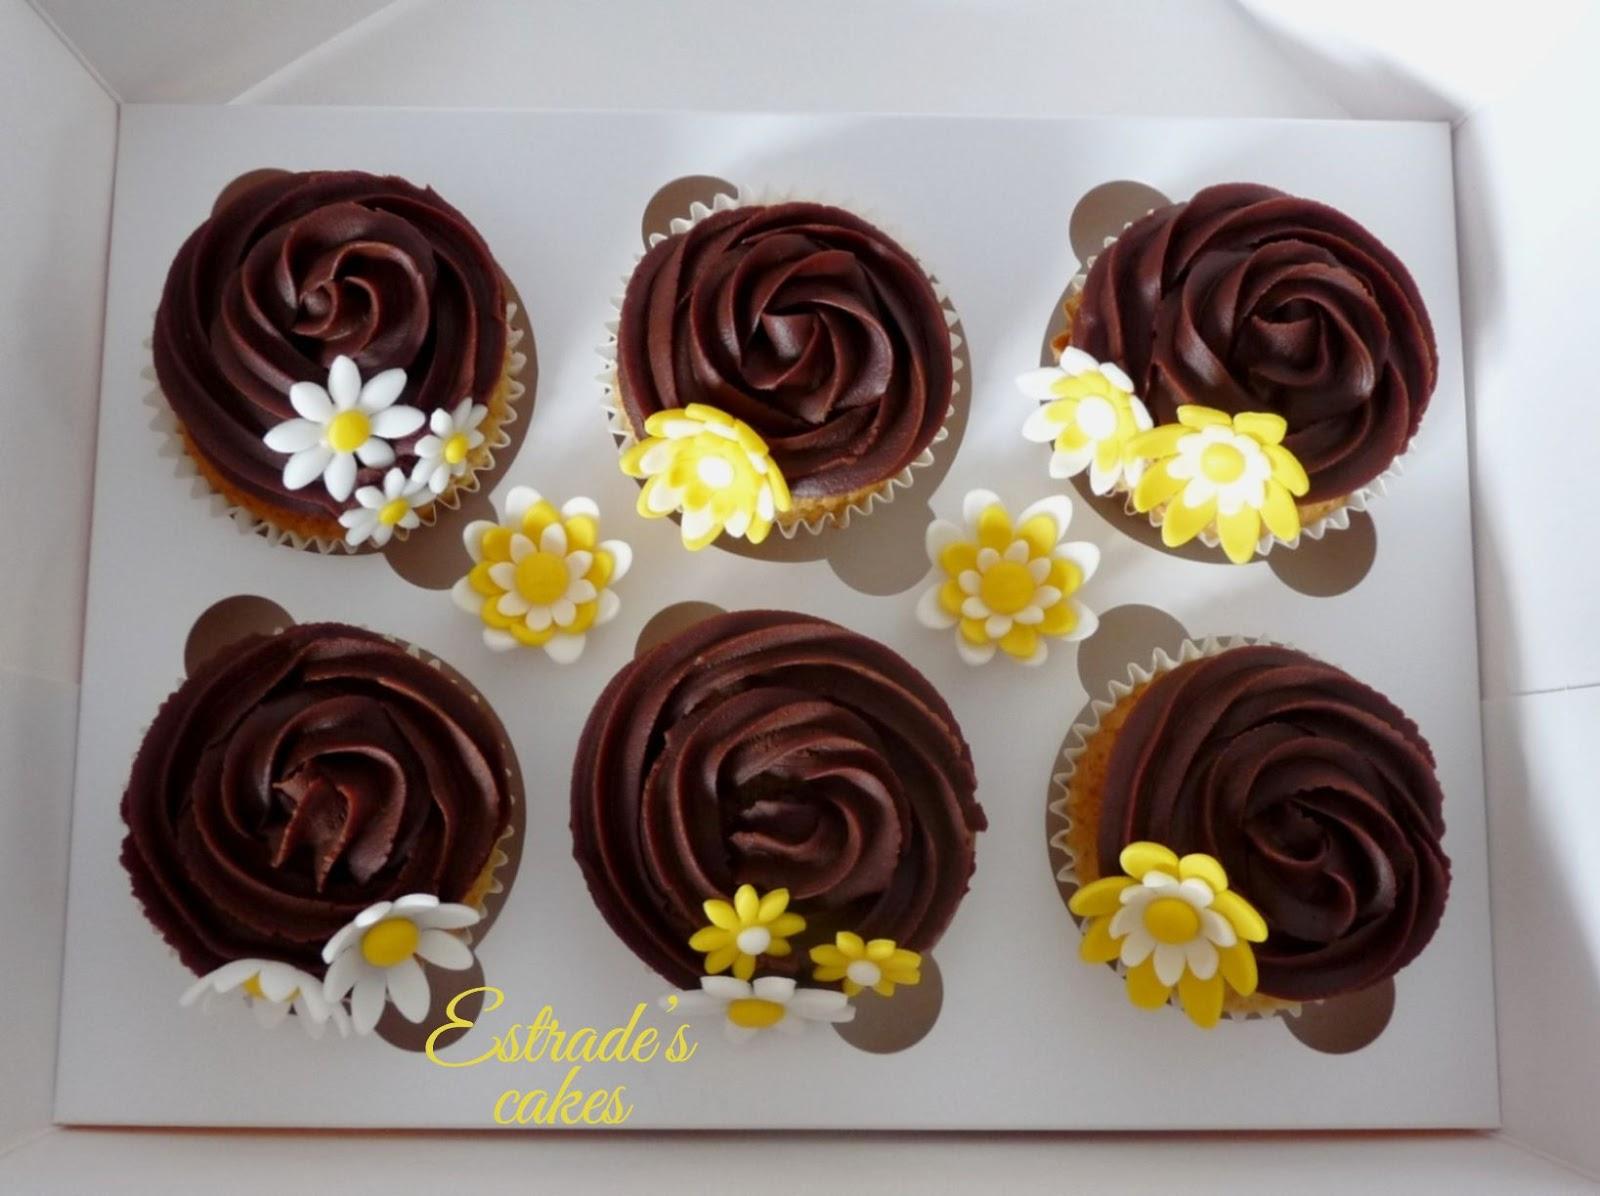 cupcakes de almendra con ganache de chocolate decorado con flores - 4